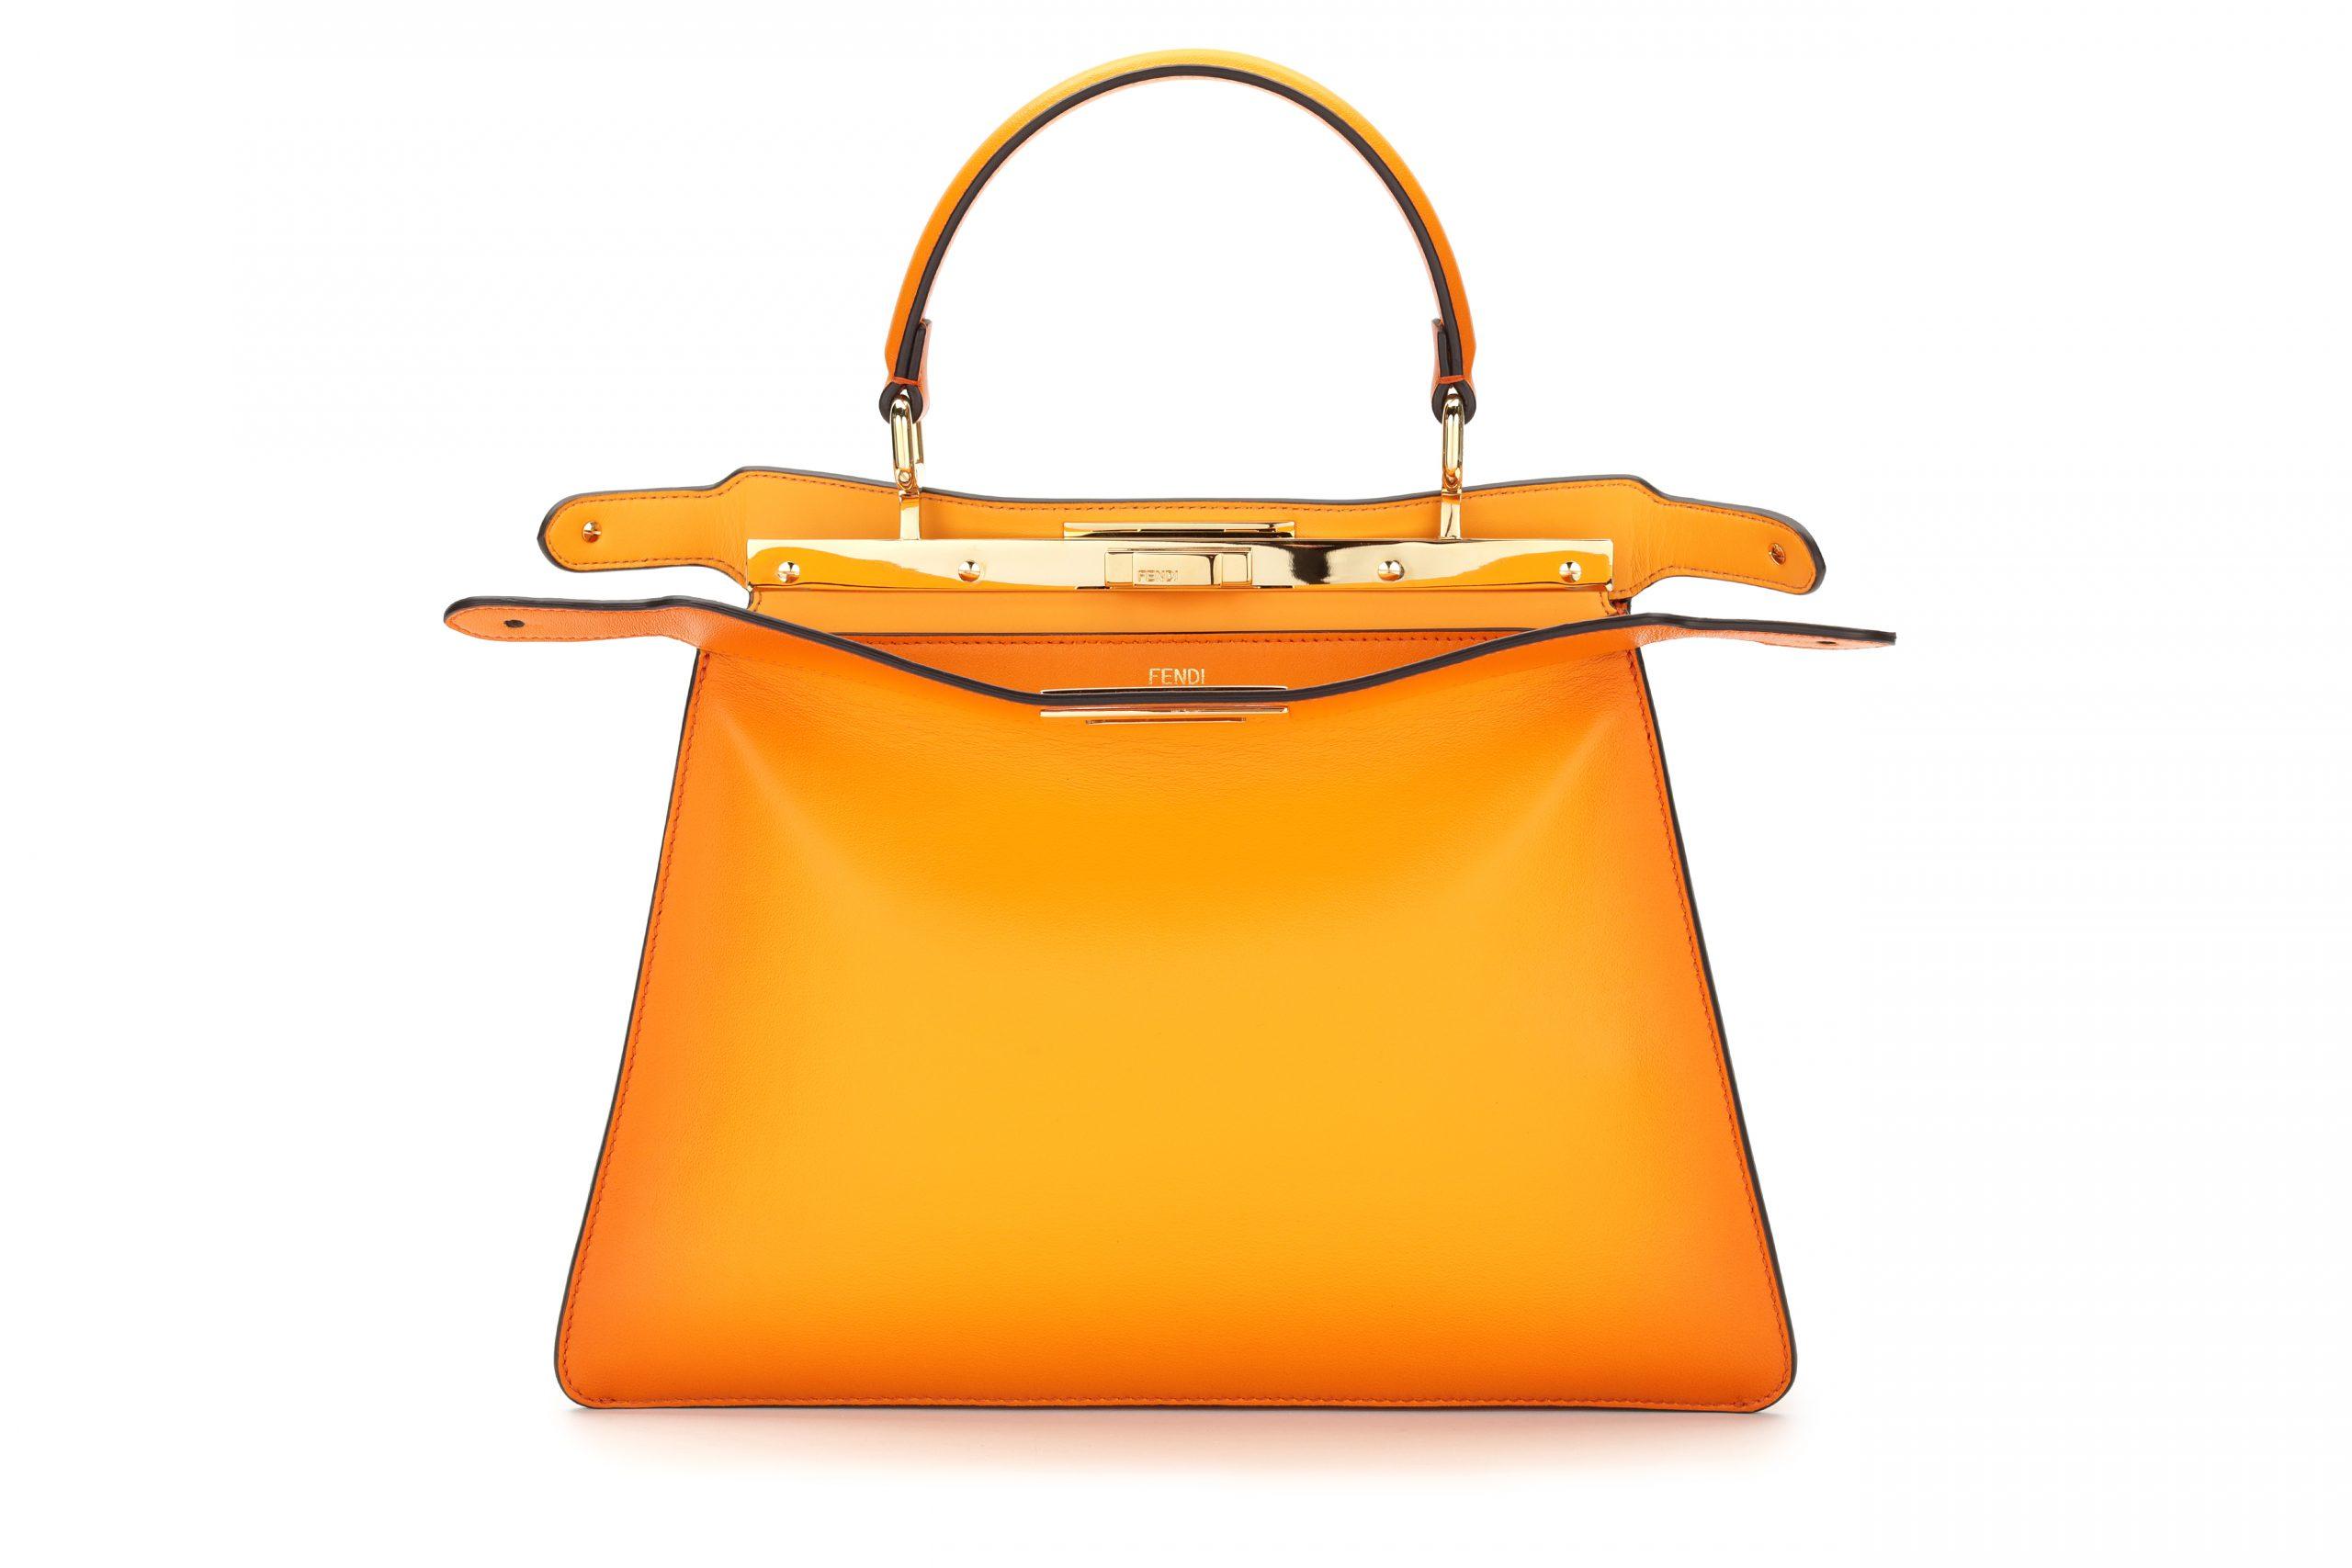 Bolso Peekaboo en naranja / Foto: Fendi